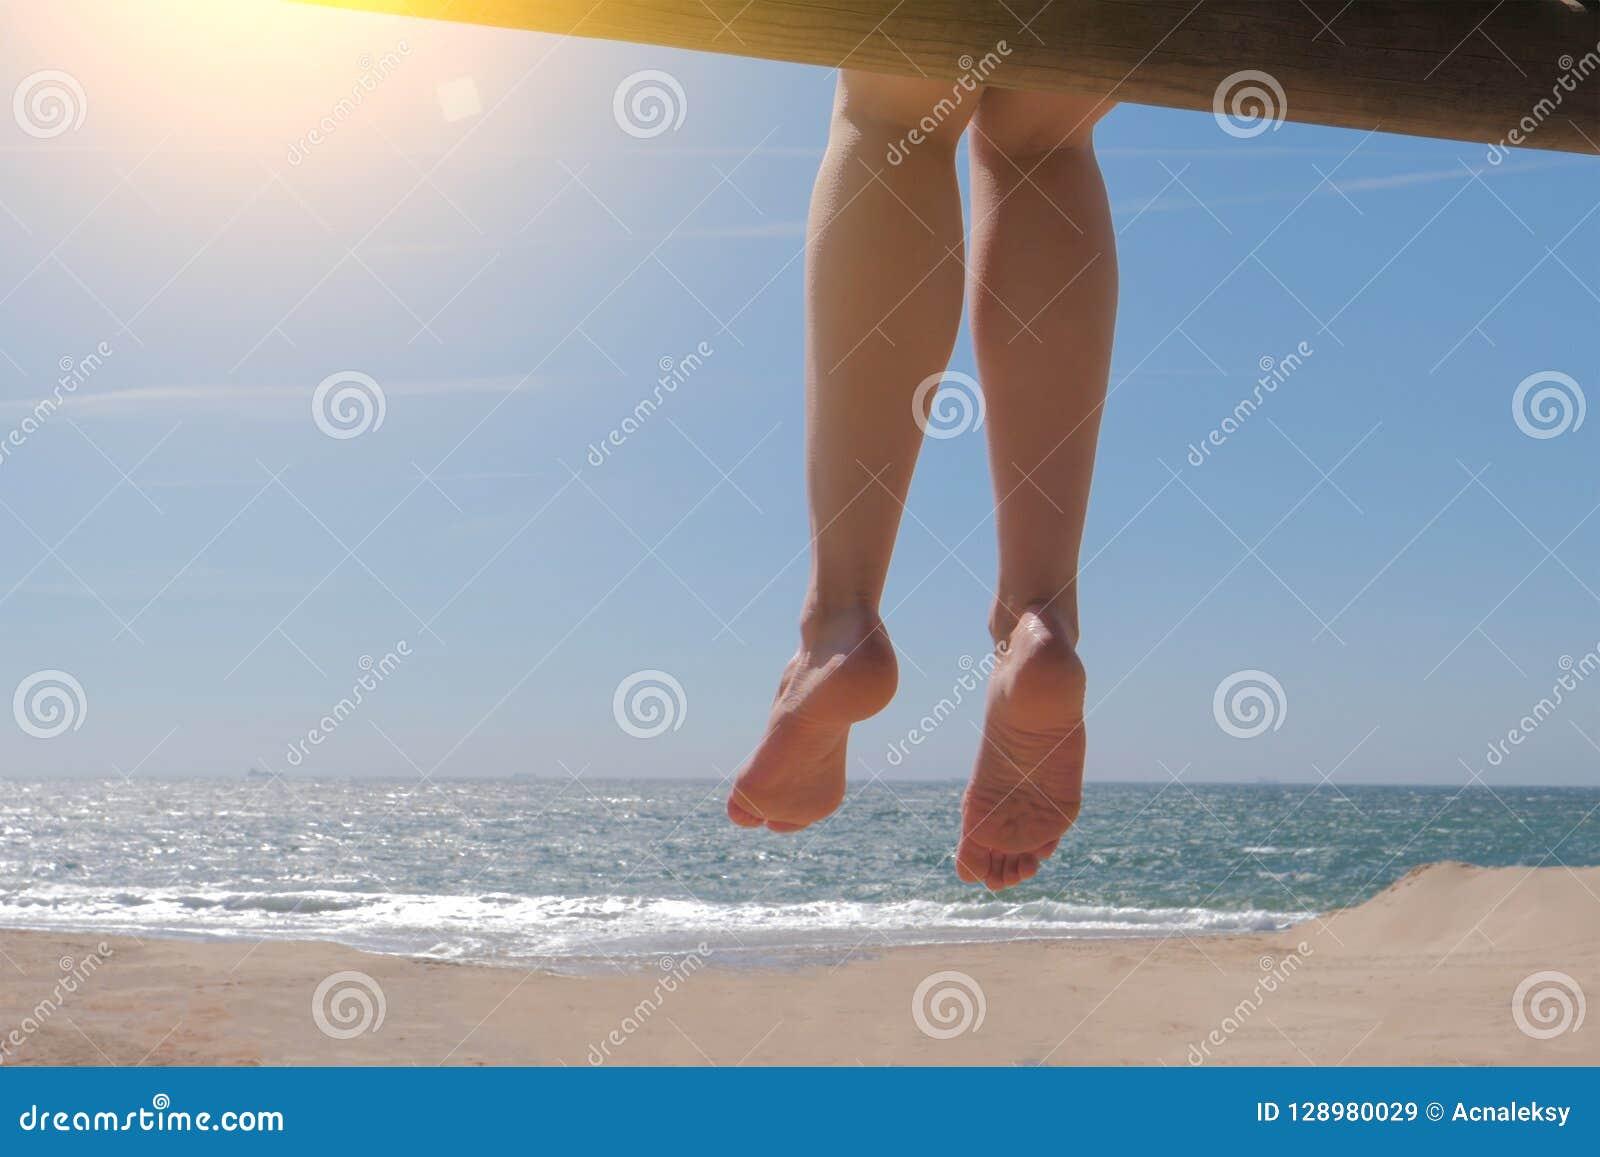 Dangling bare female feet sitting on beach.